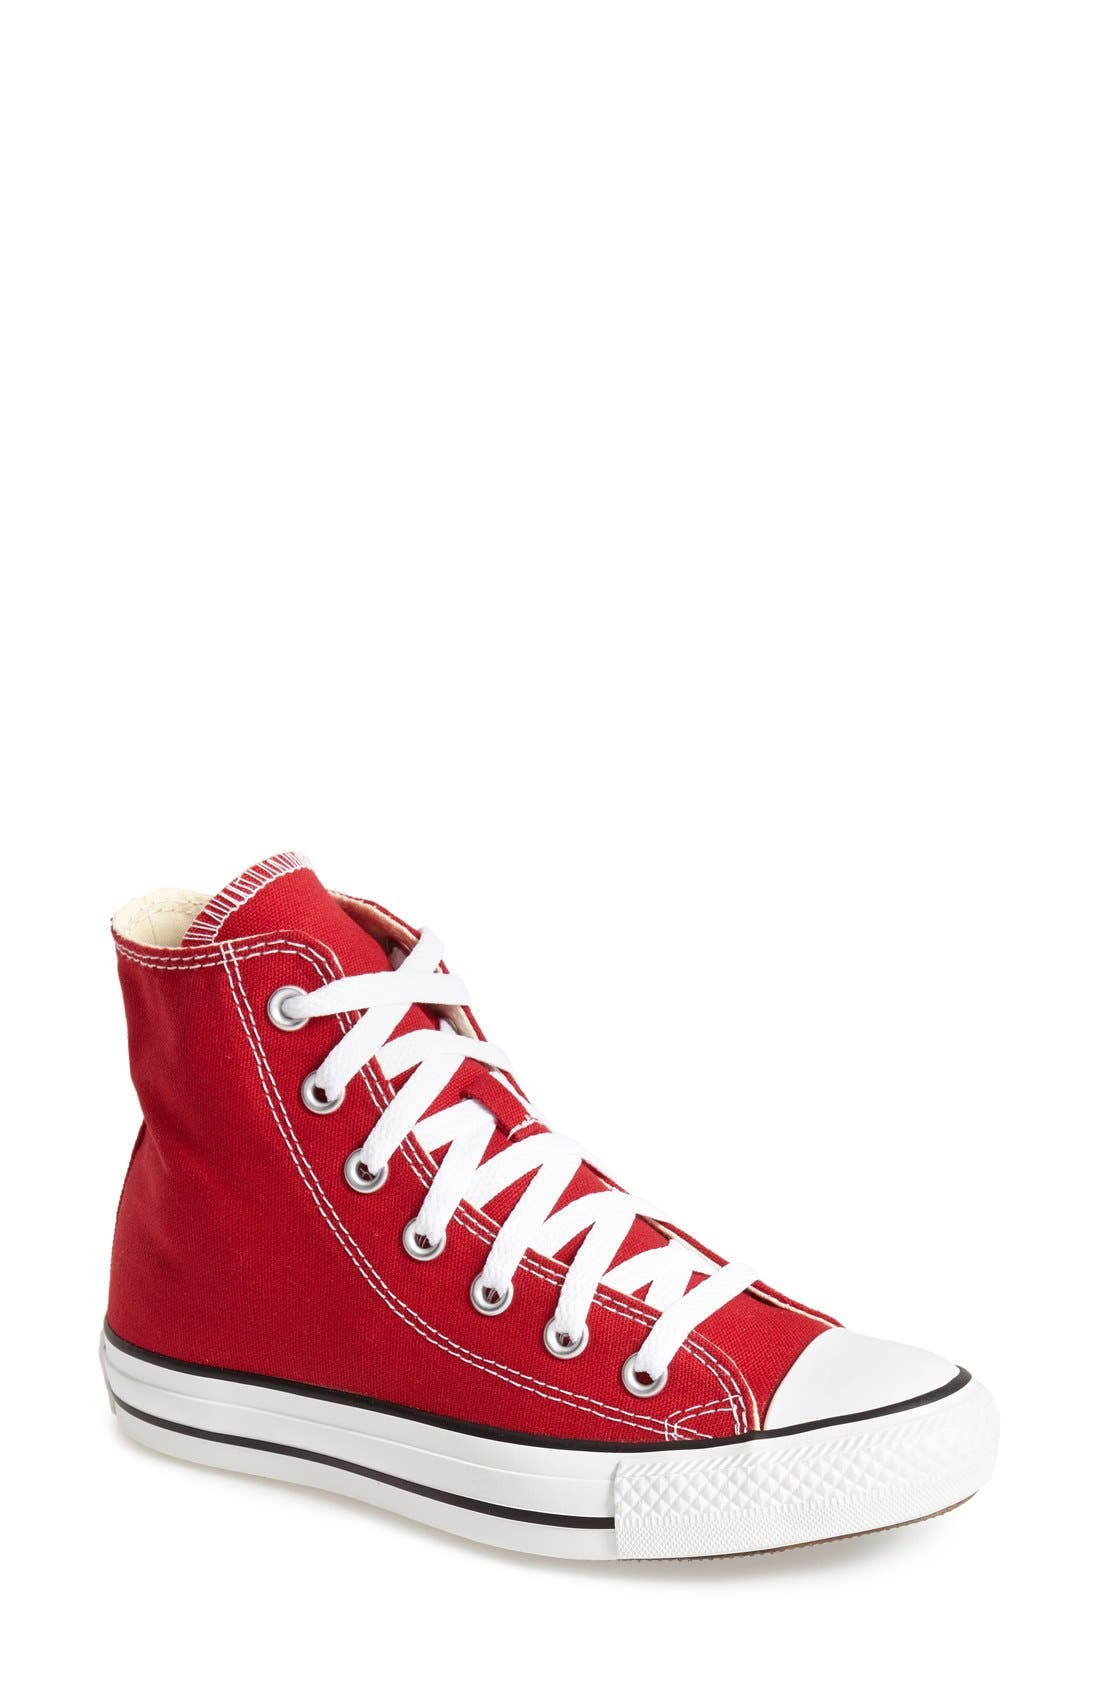 Main Image - Converse Chuck Taylor® All Star® 'Seasonal' High Top Sneaker (Women)